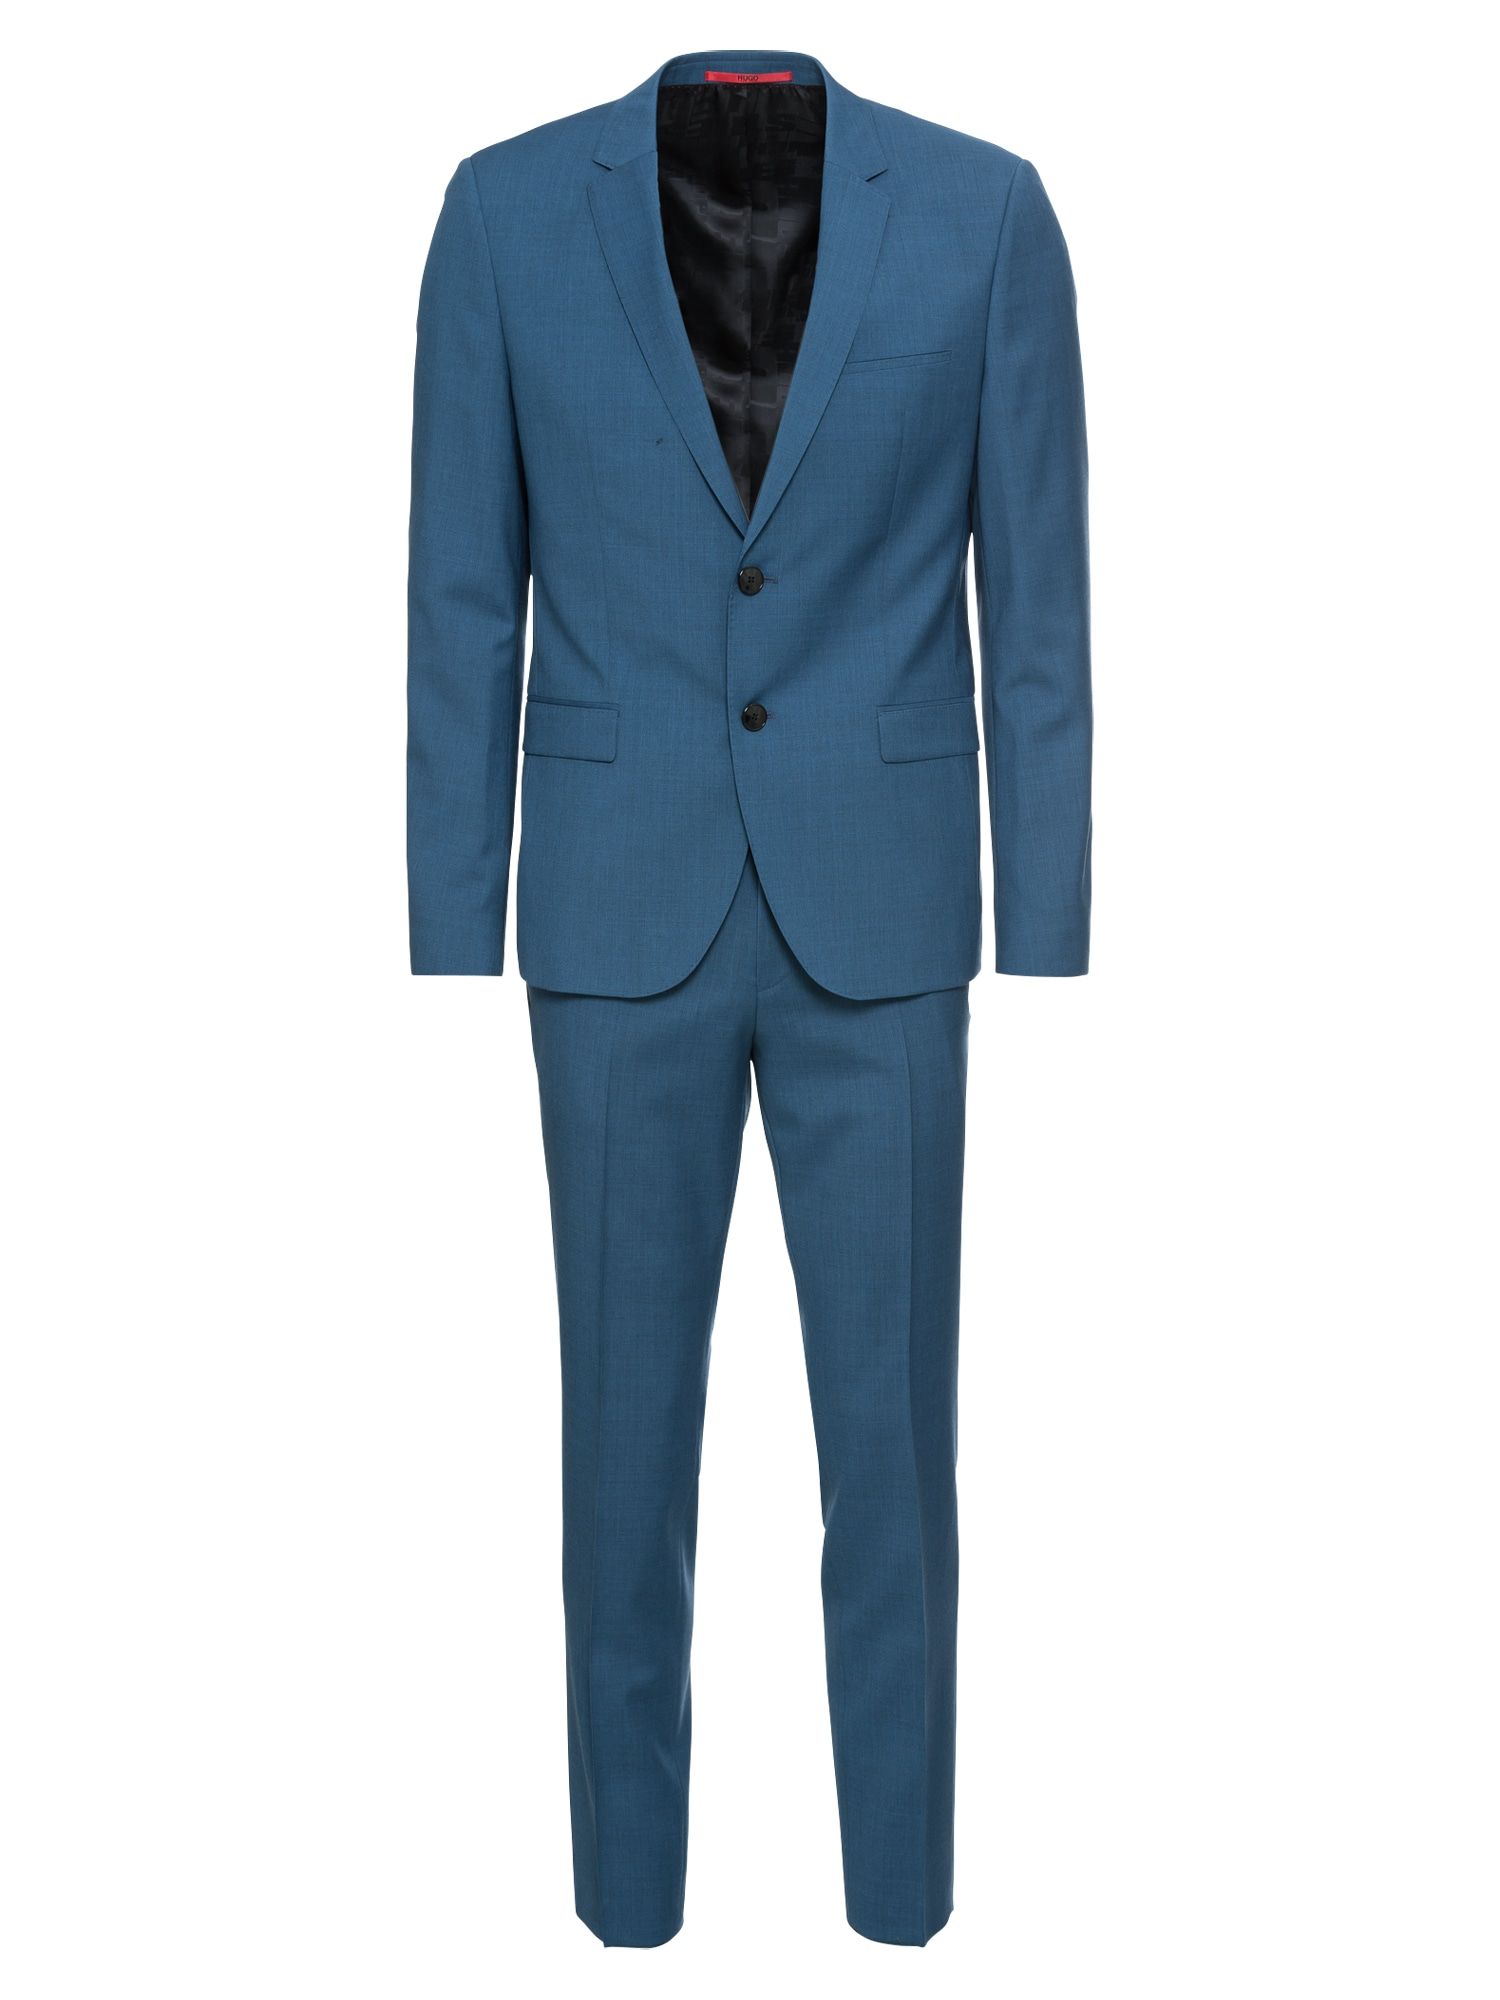 Oblek ArtiHesten182 modrá HUGO